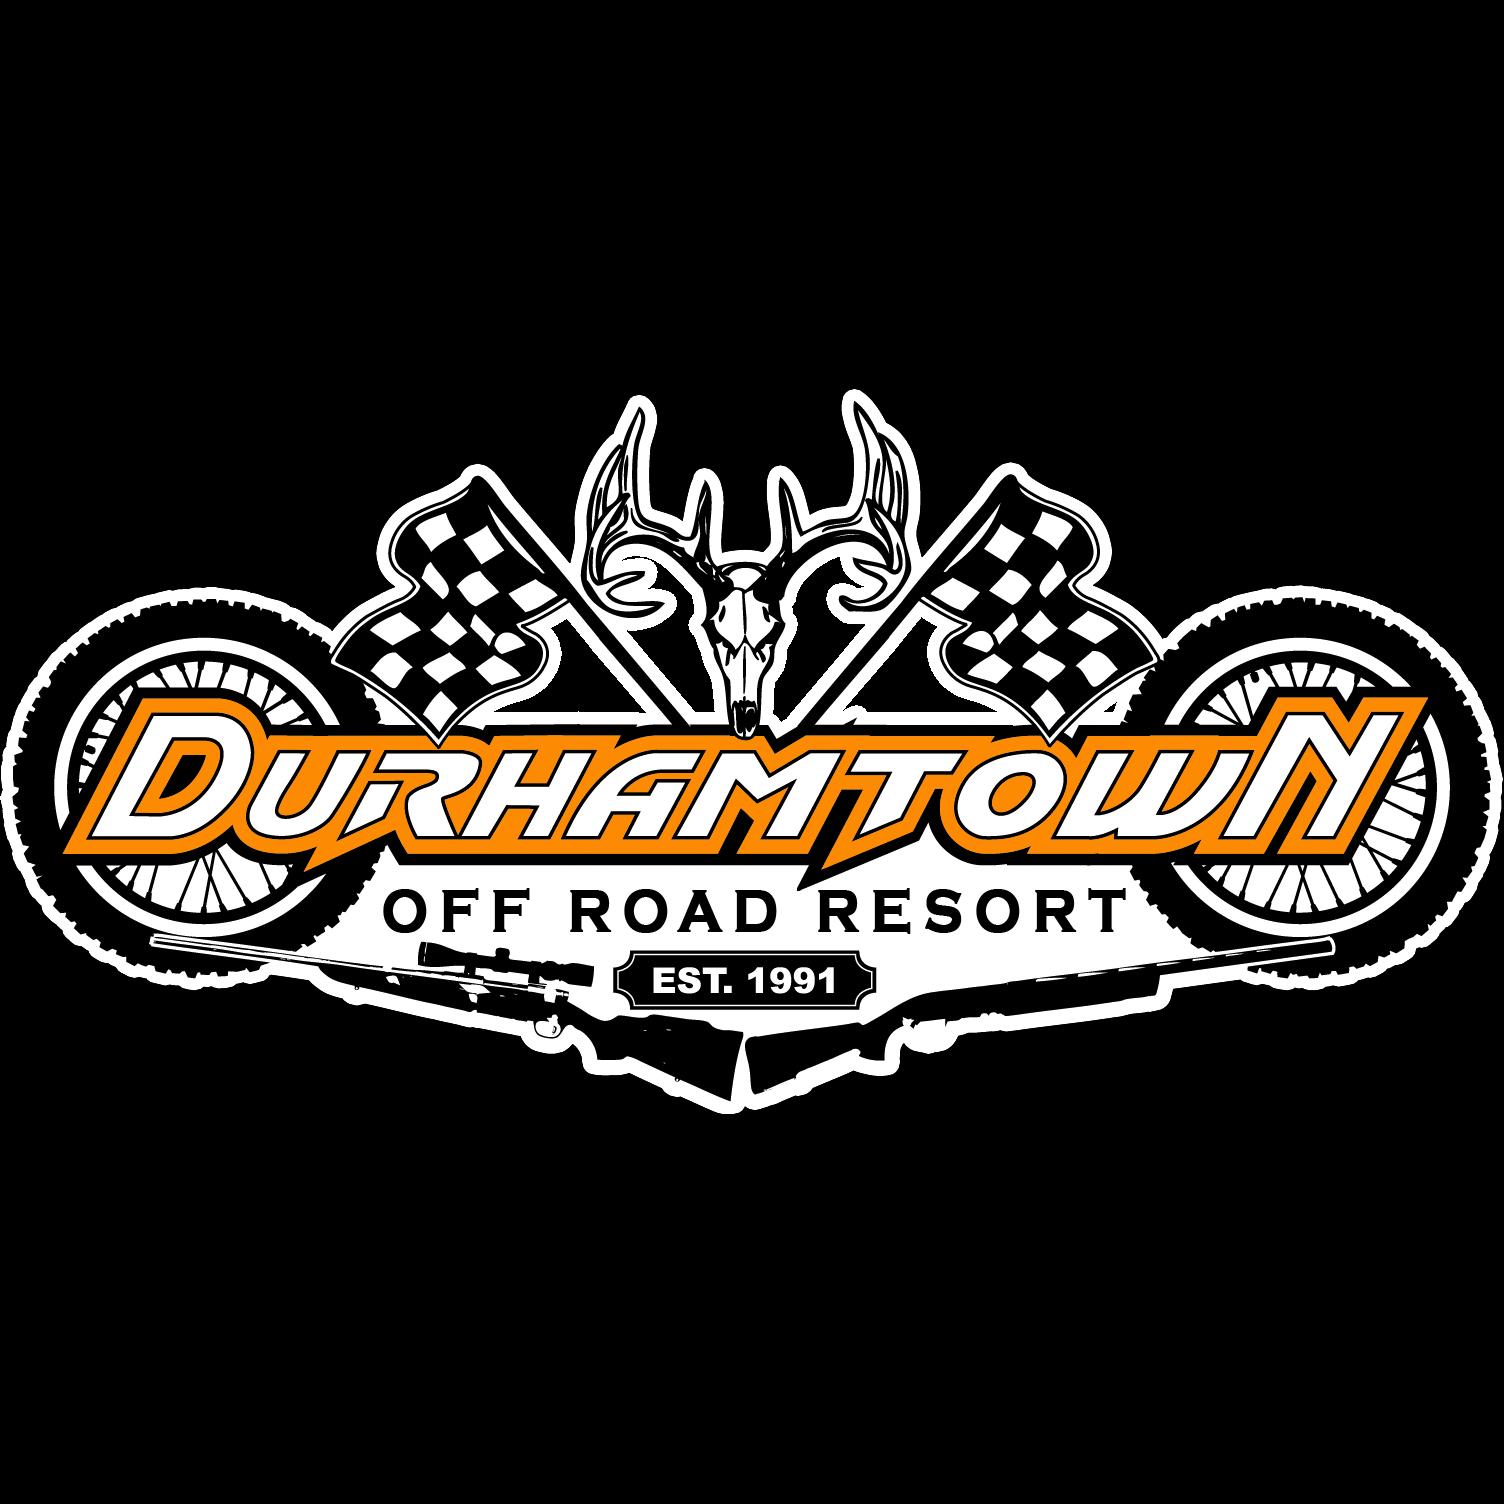 Durhamtown Off Road Resort | Trails | Tracks | Rentals | Lodging